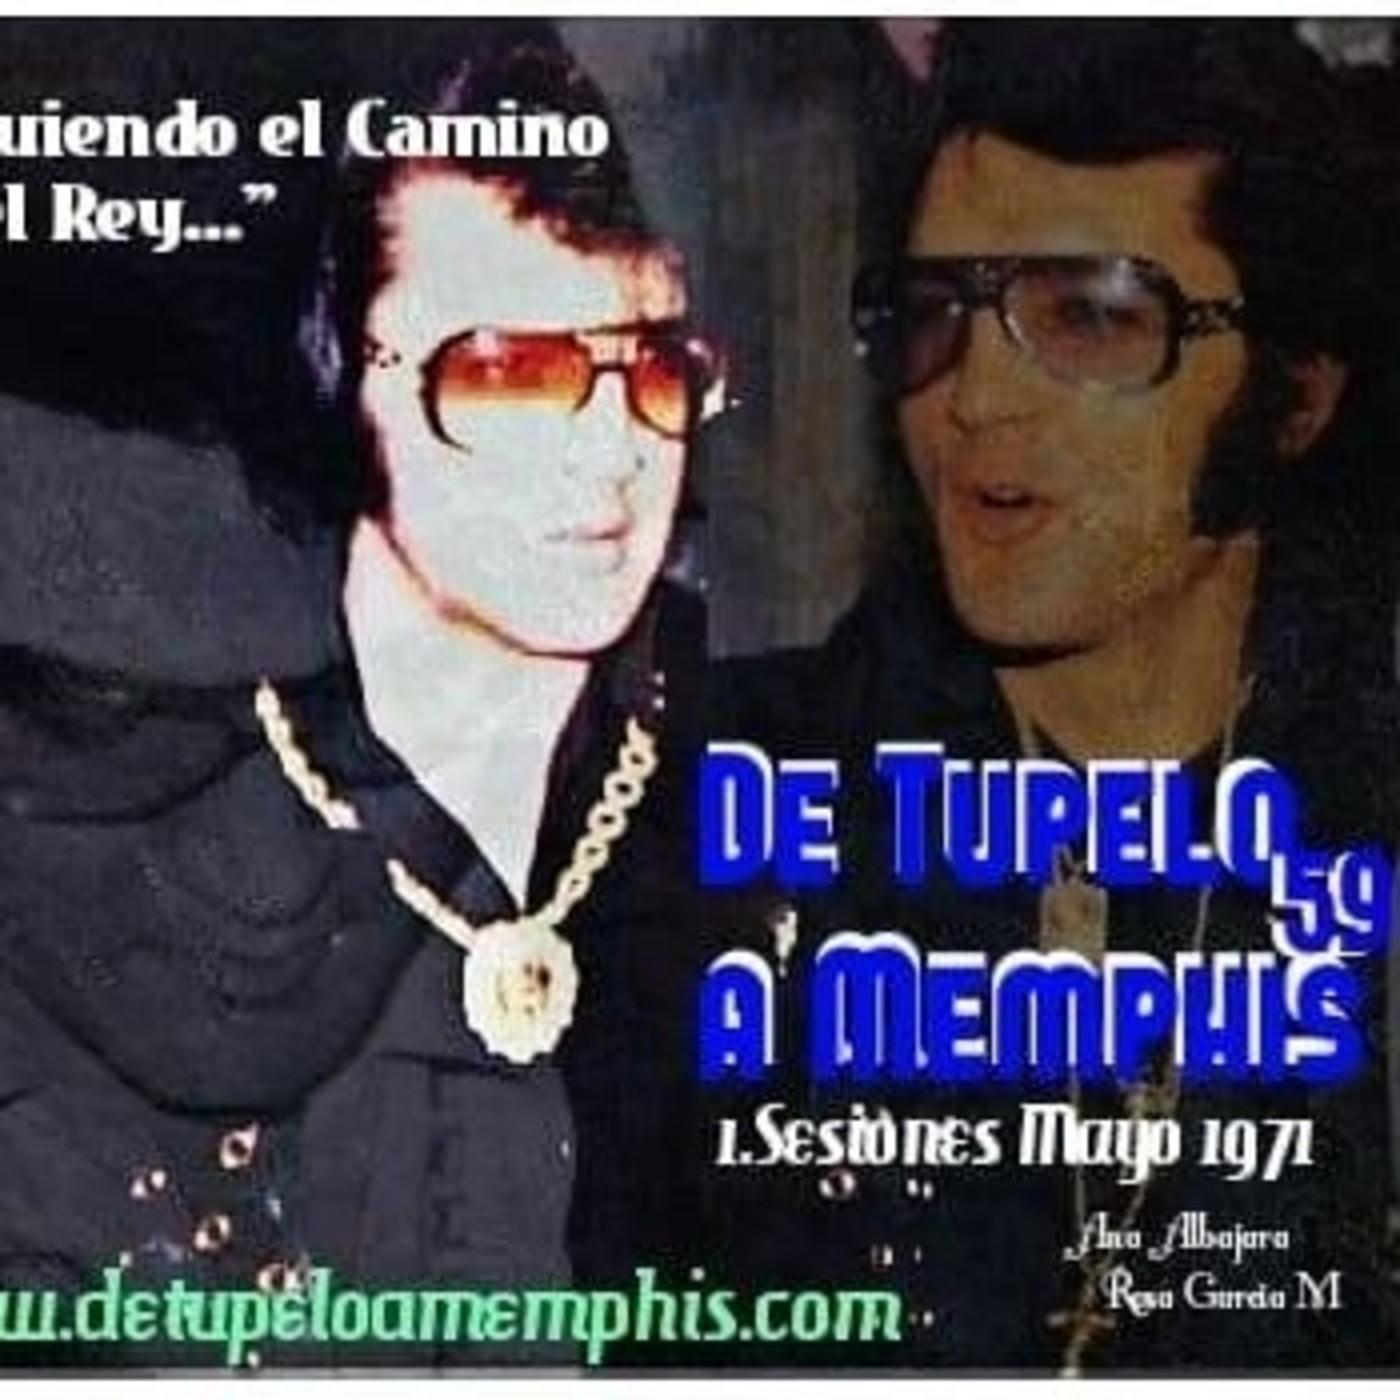 DE TUPELO A MEMPHIS 59 . 1 Sesiones Mayo RCA. 1971